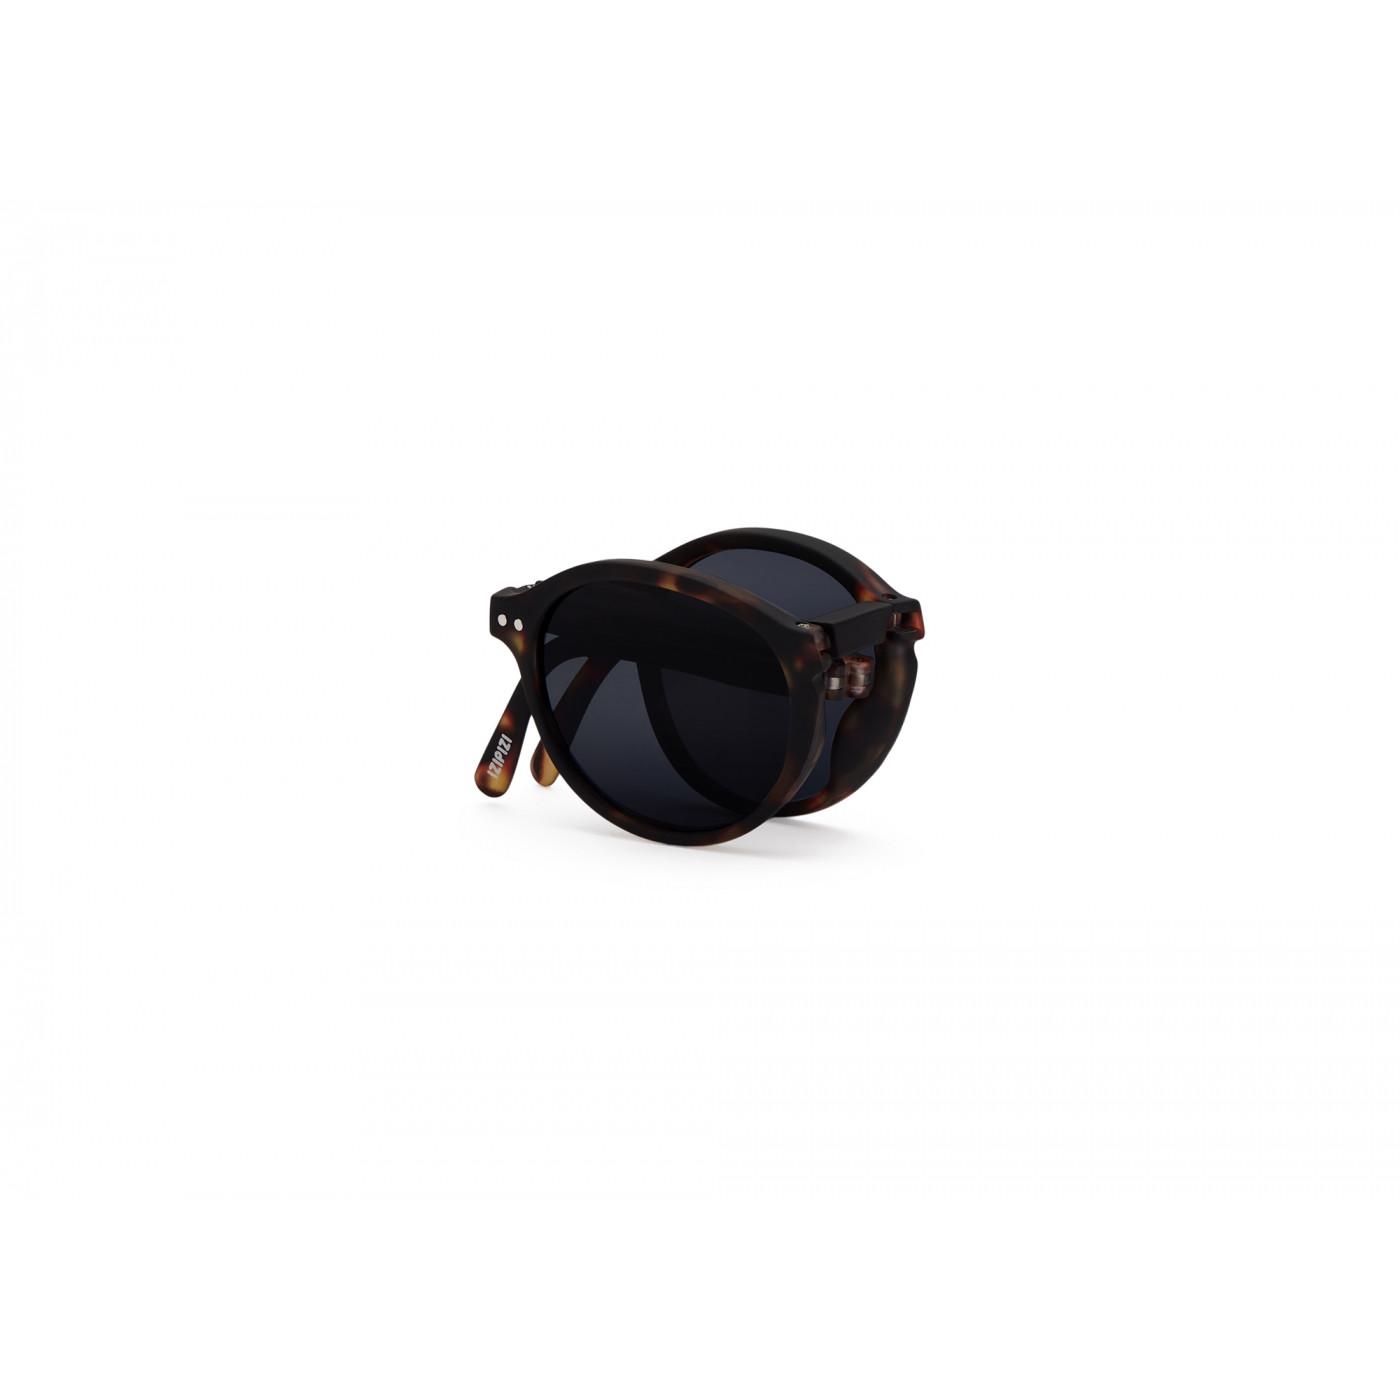 IZIPIZI   #F款 玳瑁/灰色鏡片 摺疊太陽眼鏡